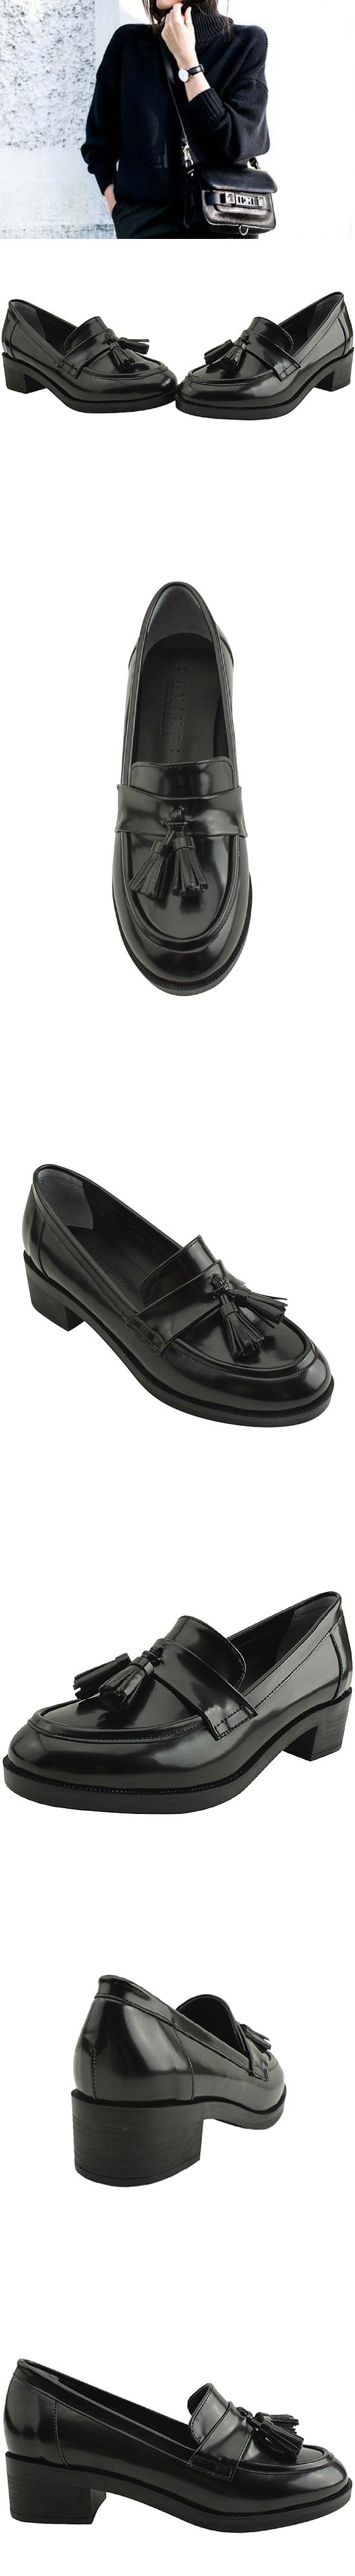 Tassel full-heeled classic loafer shoes 4cm